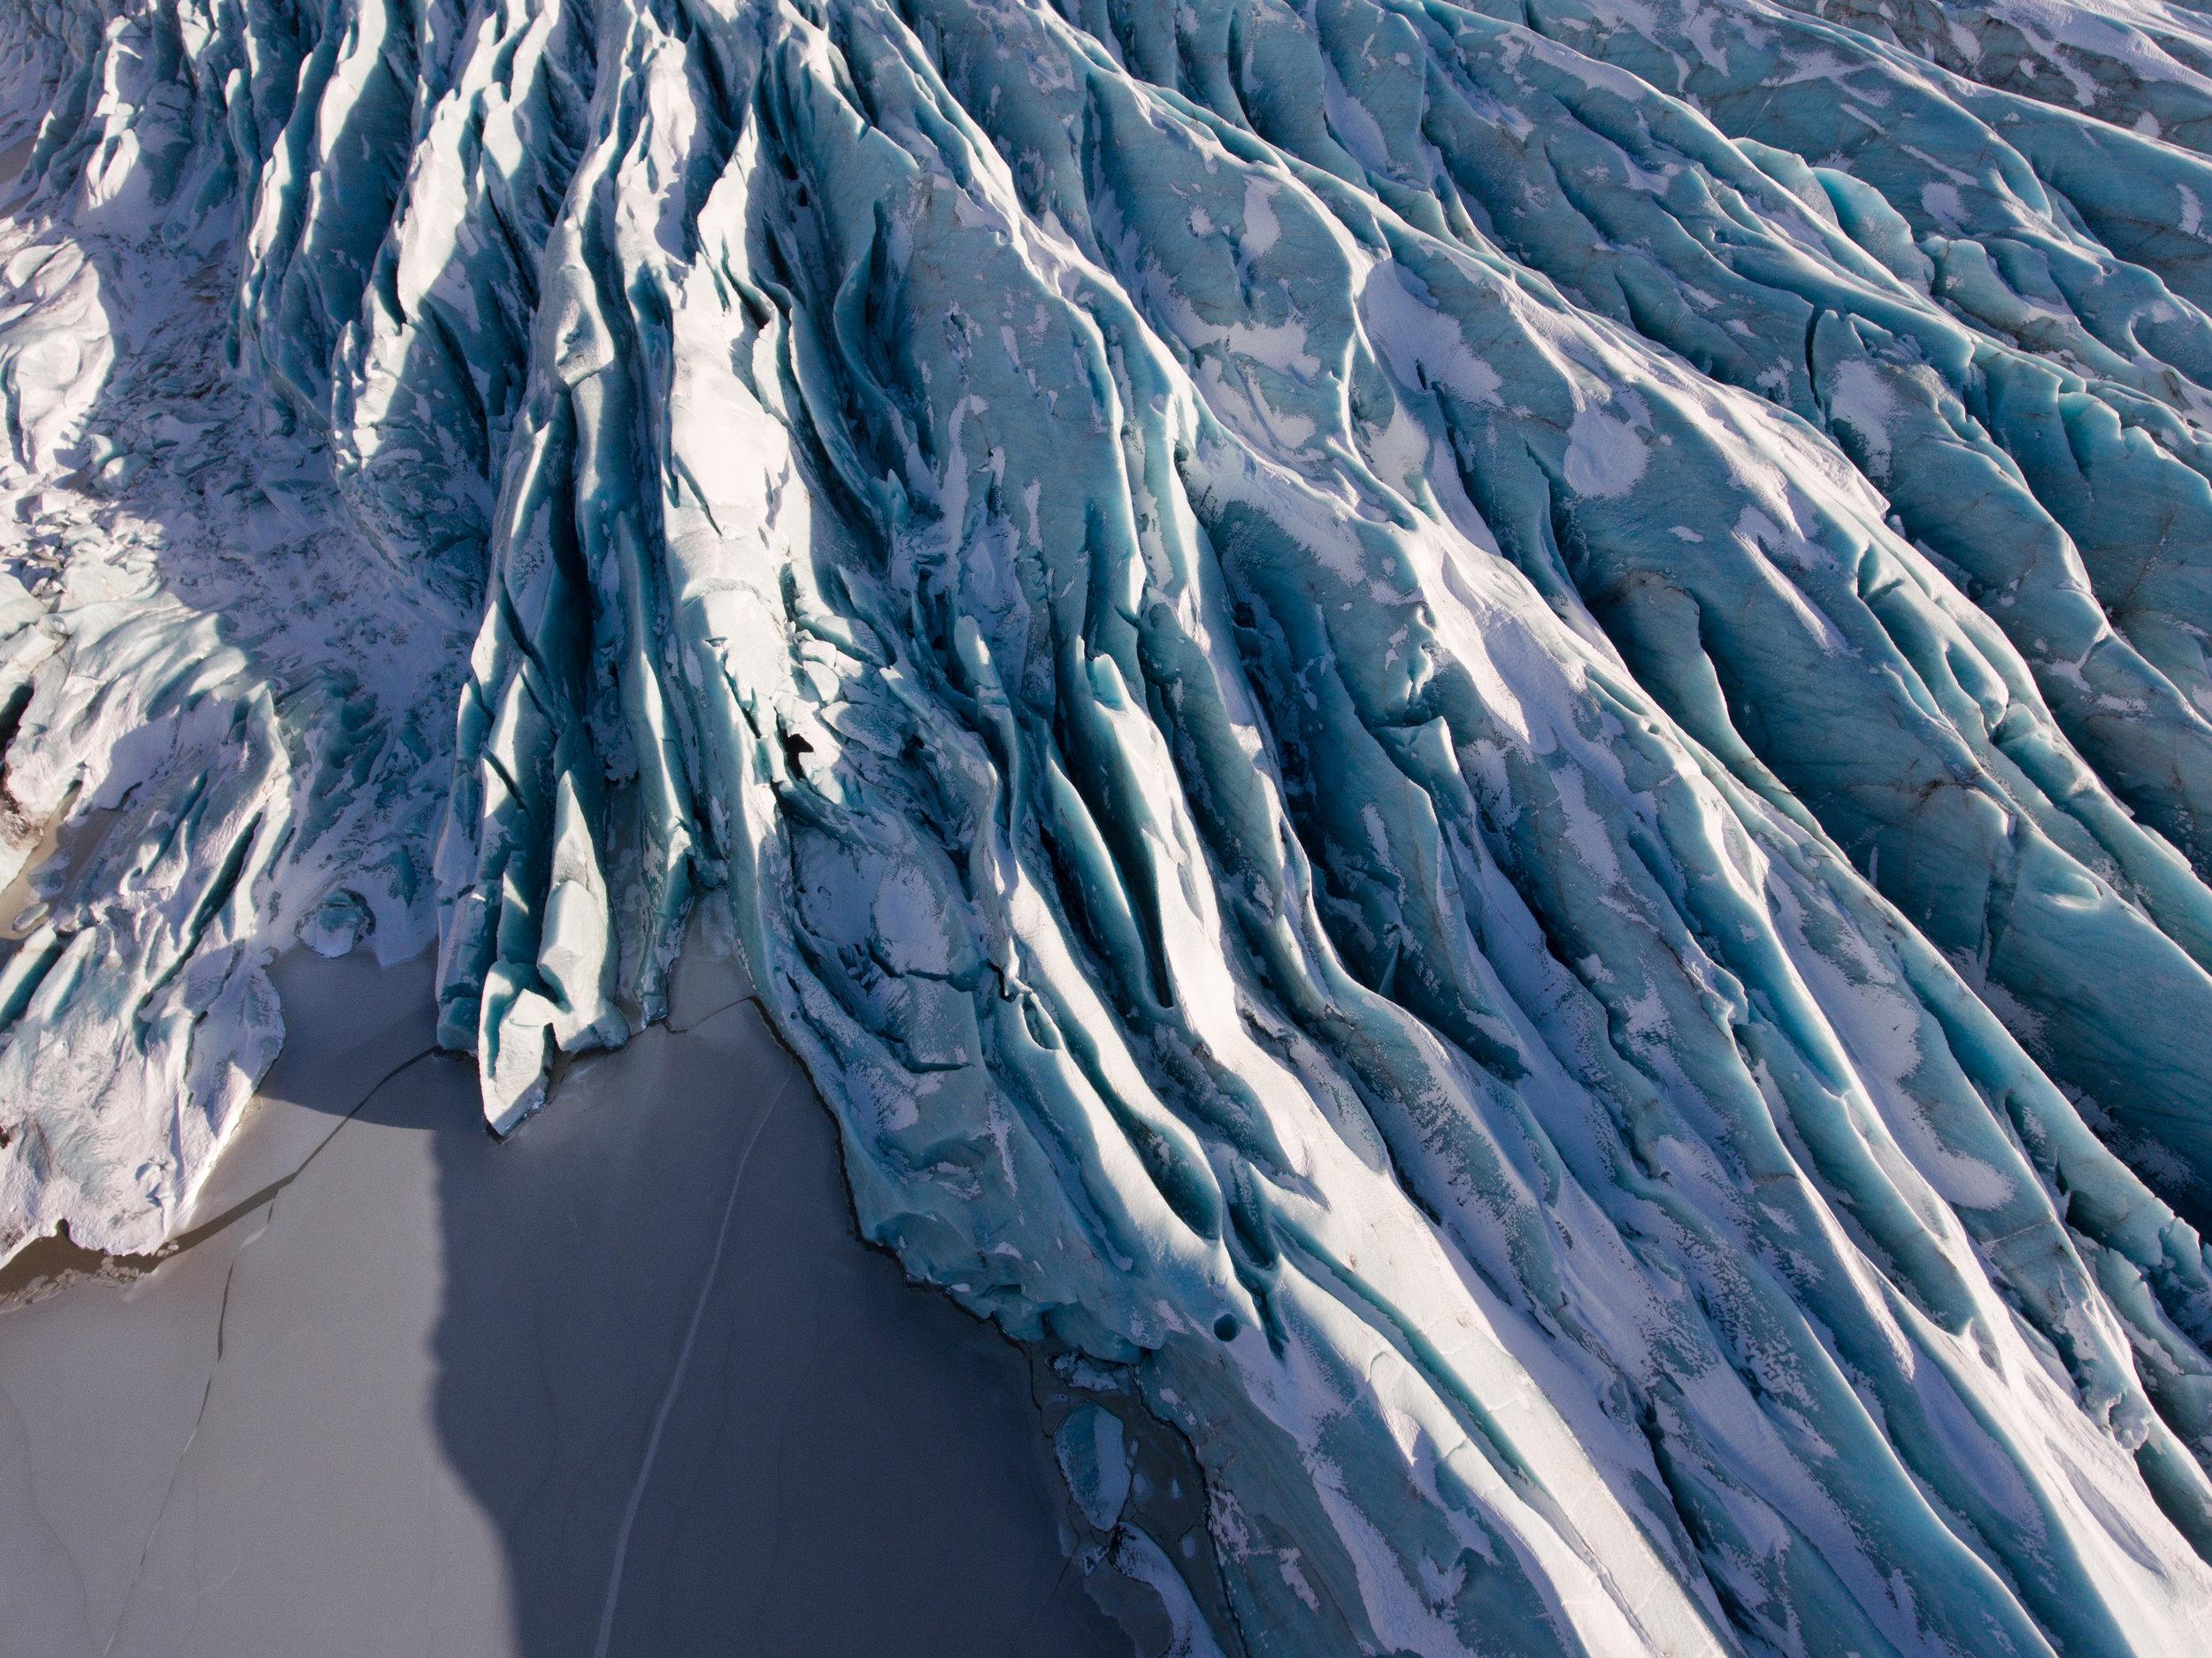 jermiah-schuster-iceland-460.jpg